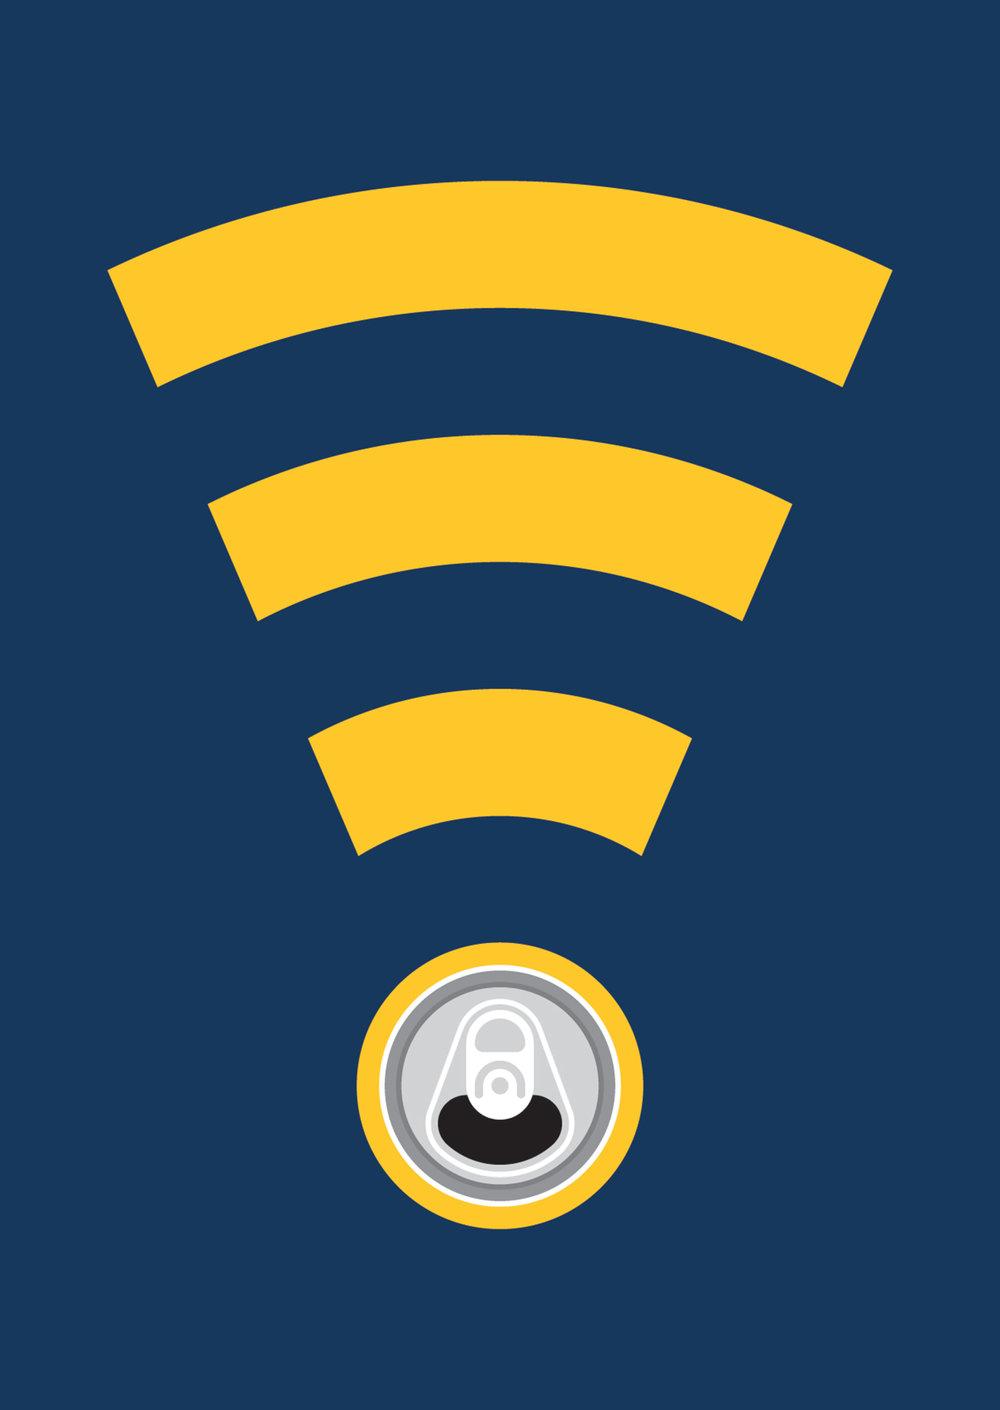 Pate_Homeless-Wi-Fi.jpg